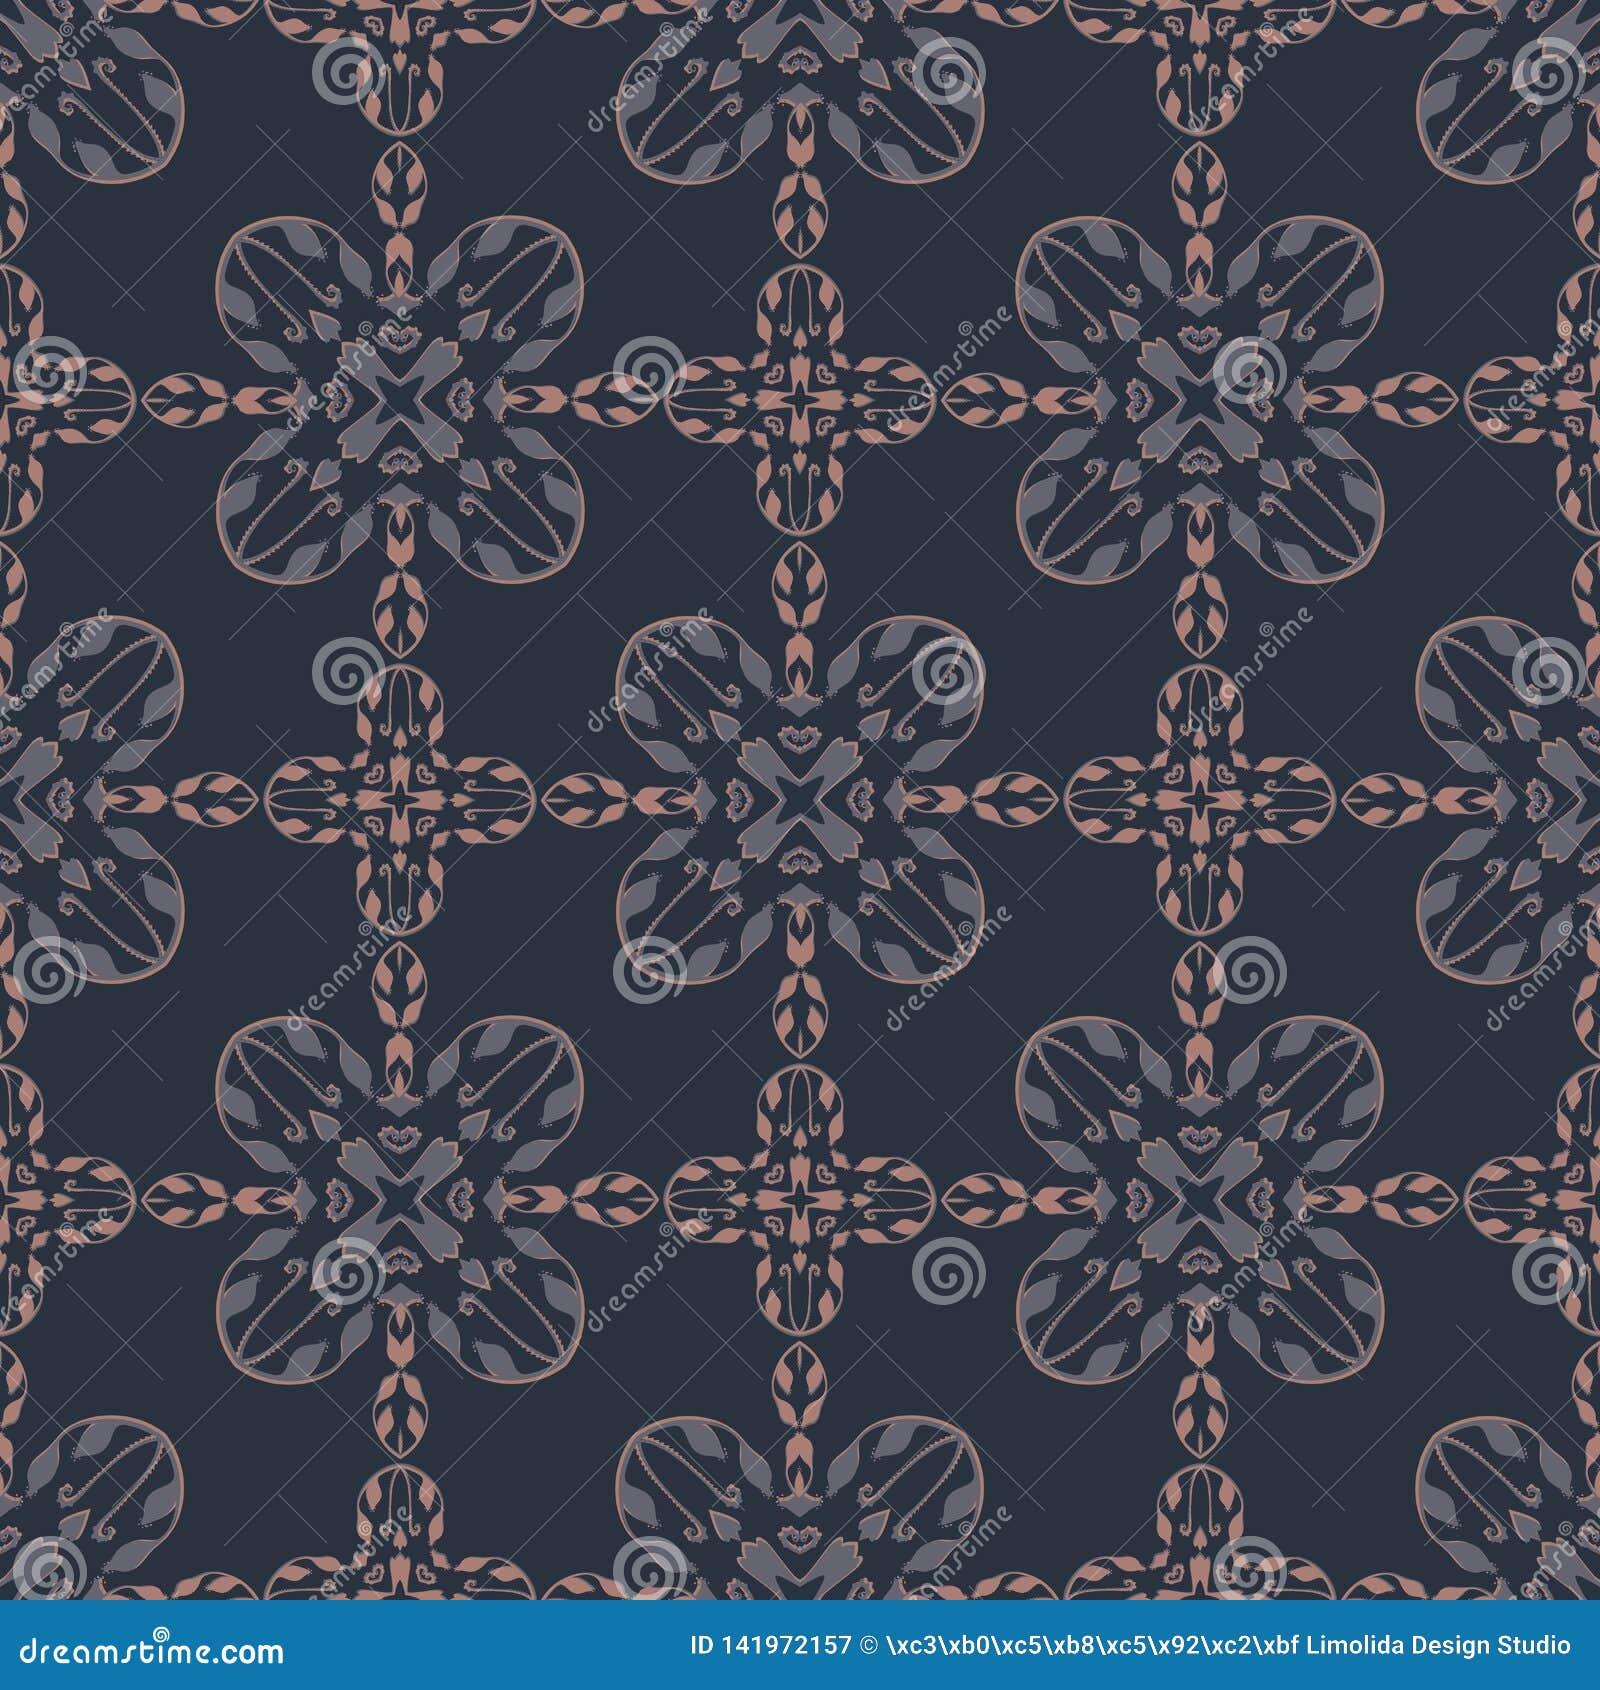 Navy Blue Tile Damask Seamless Vector Pattern, Hand Drawn Floral Ornament Illustration